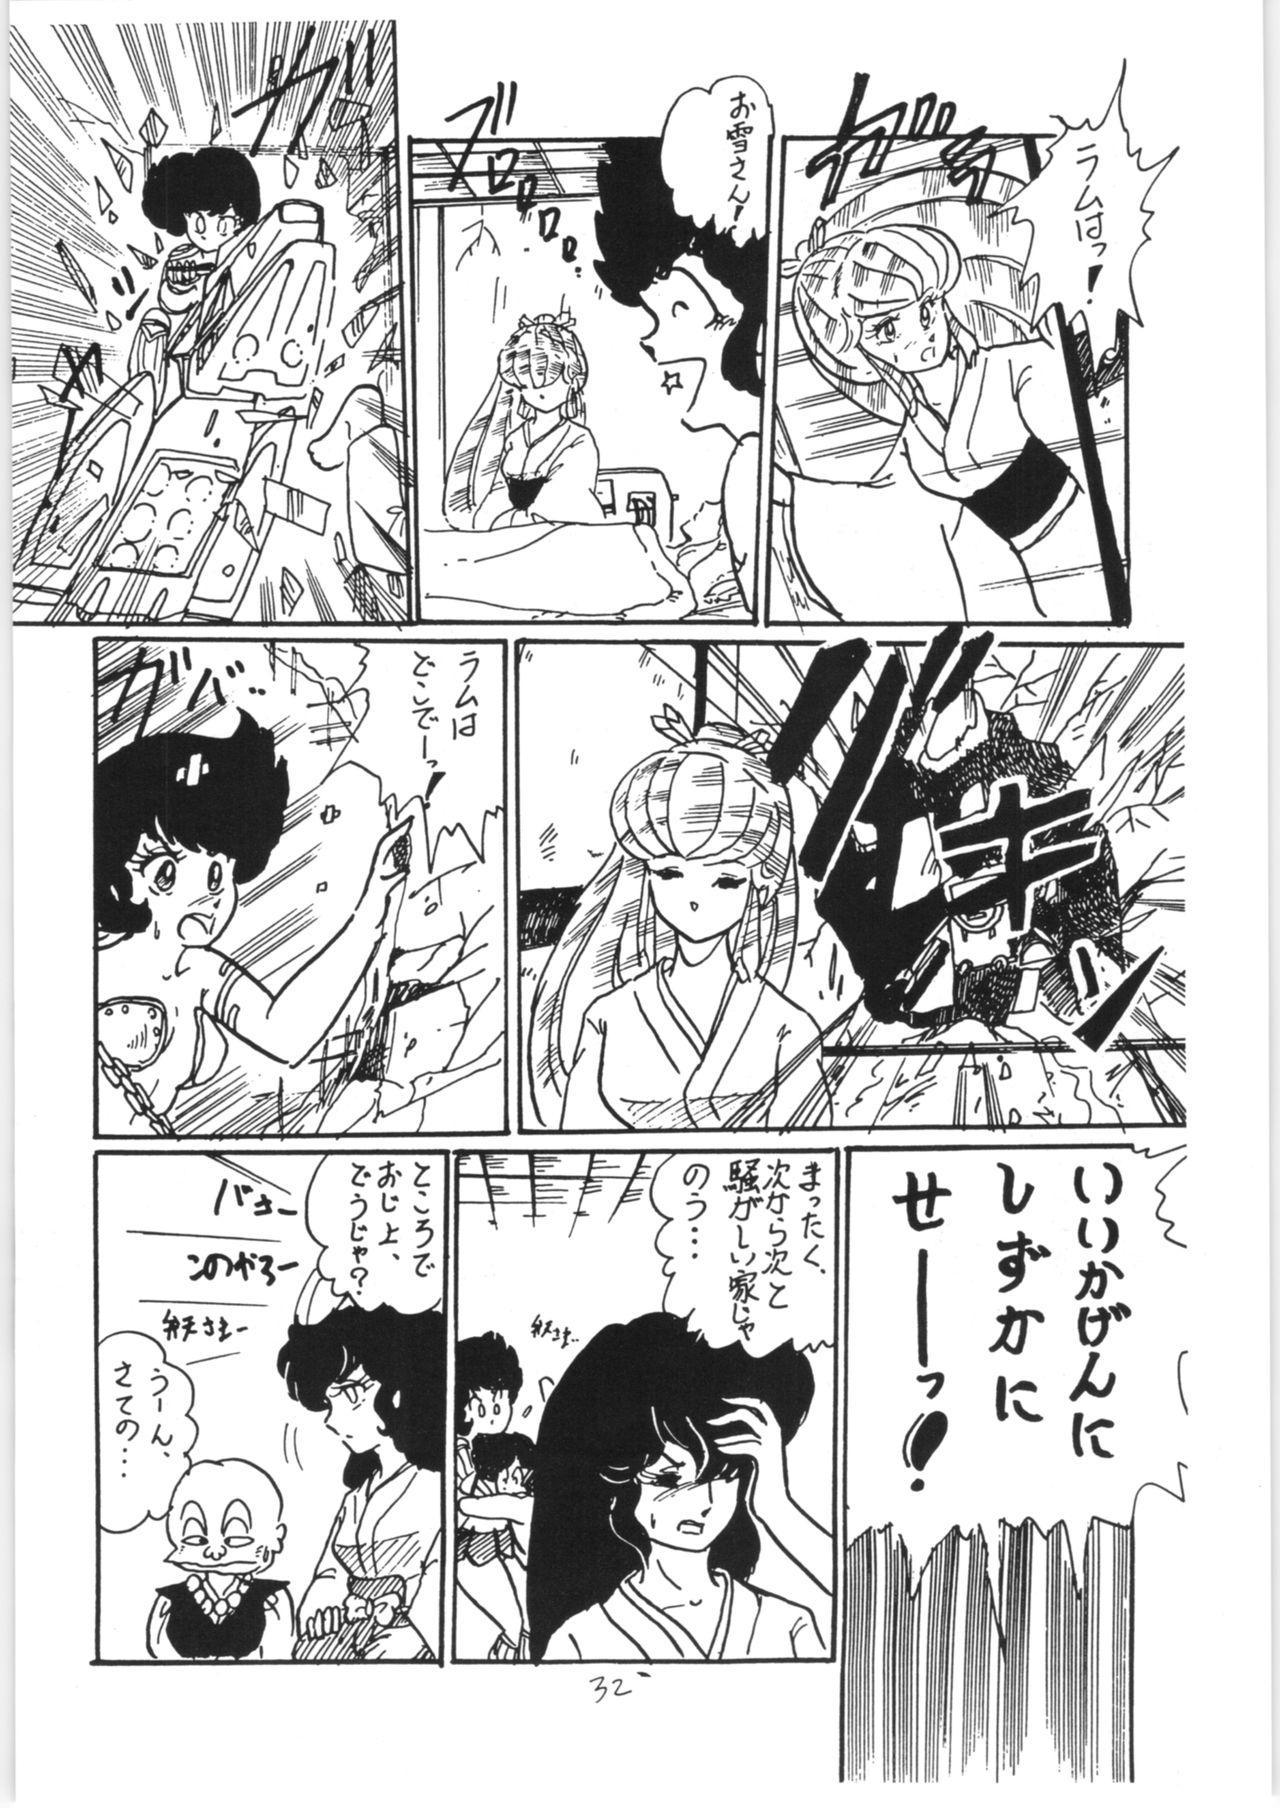 Ranma no Manma 3 v2 30